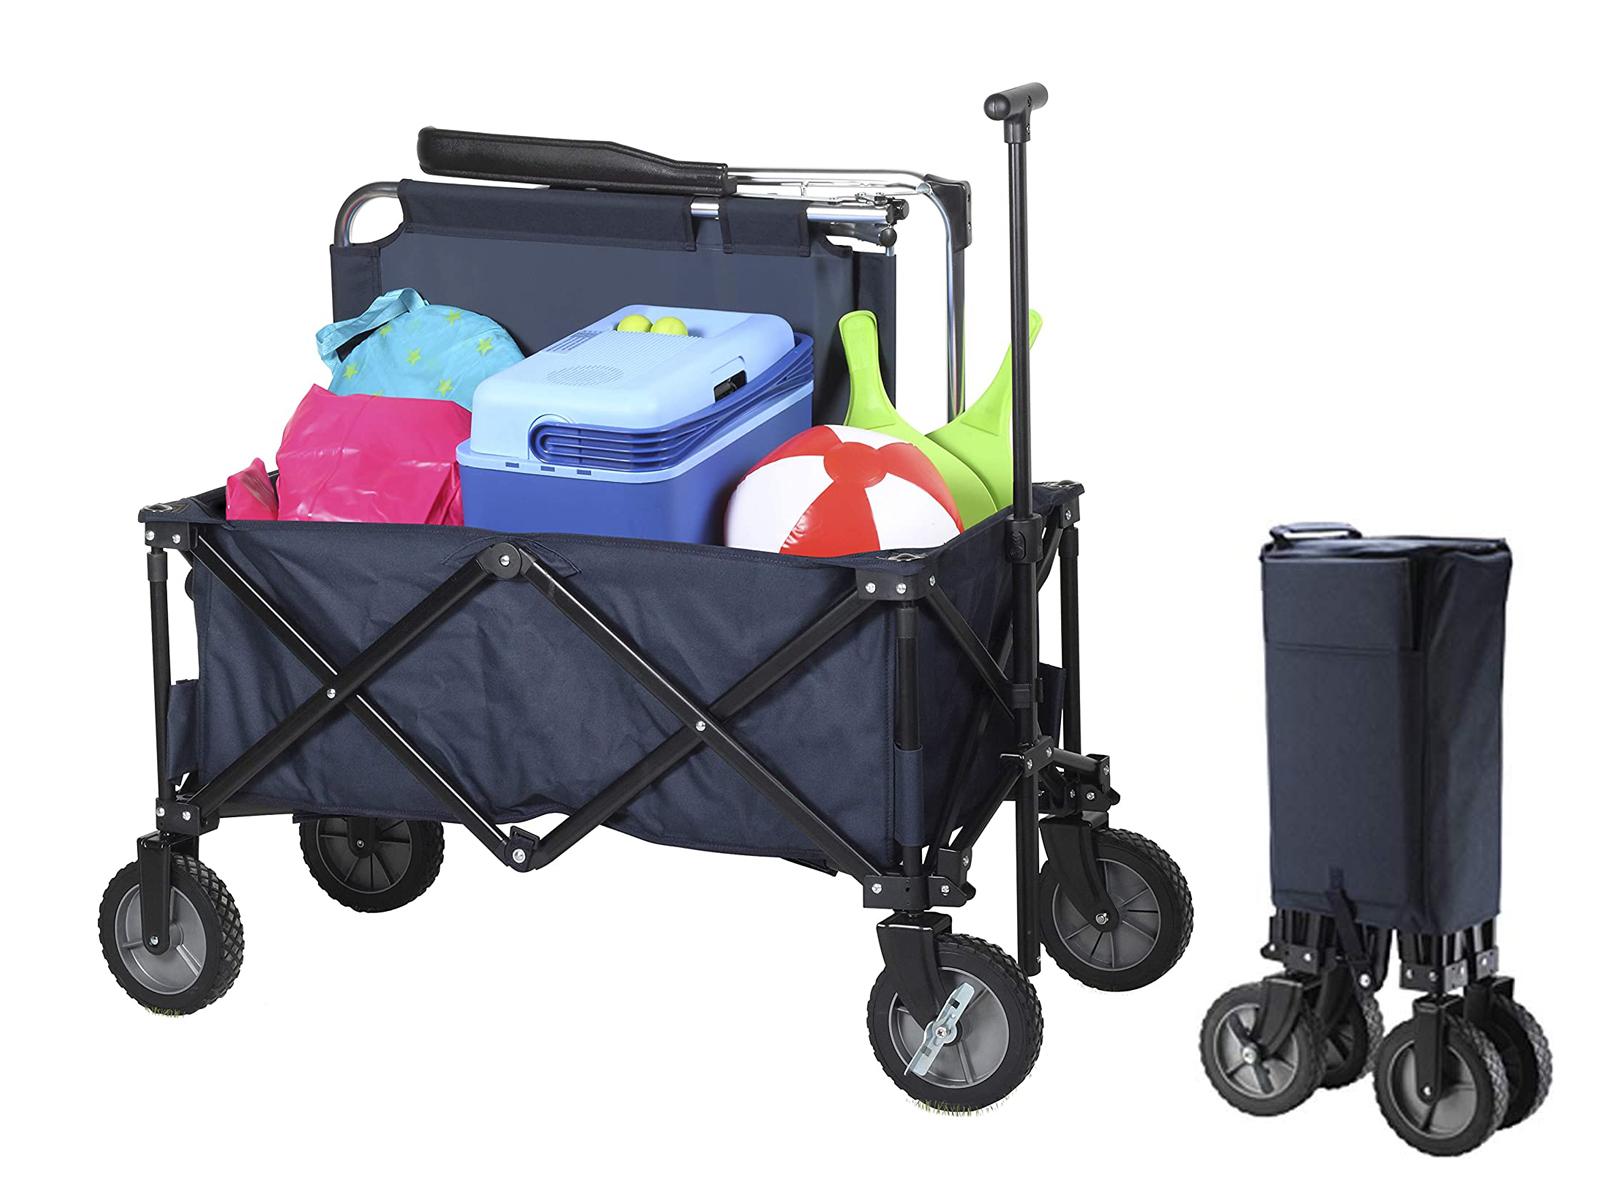 faltbarer bollerwagen bis max 70 kg strand transportwagen gummireifen eur 99 49 picclick de. Black Bedroom Furniture Sets. Home Design Ideas